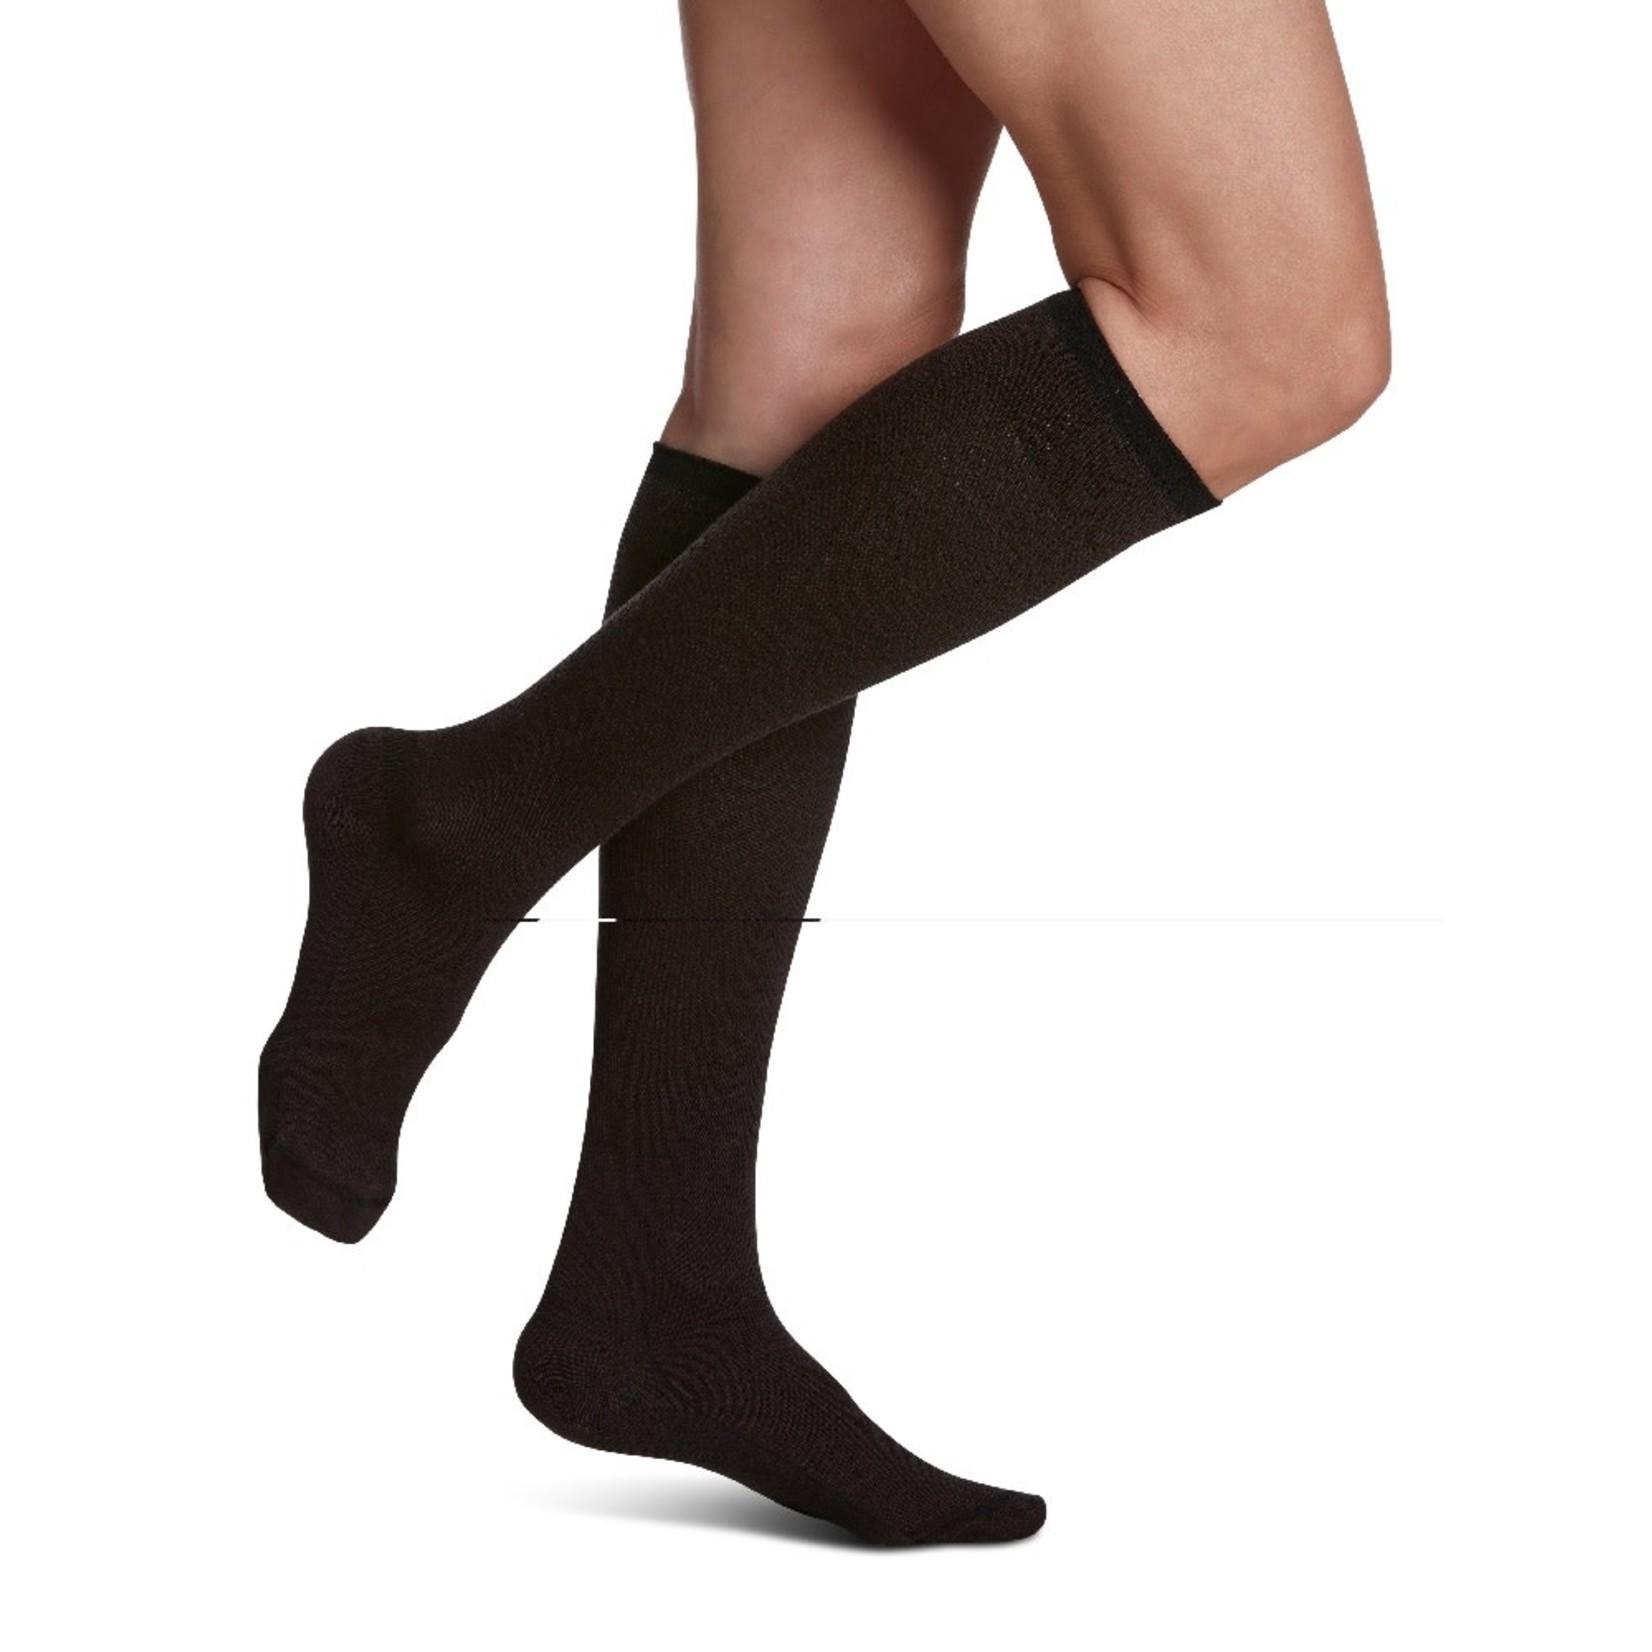 SIGVARIS Women's All-Season Merino Wool Calf 15-20mmHg